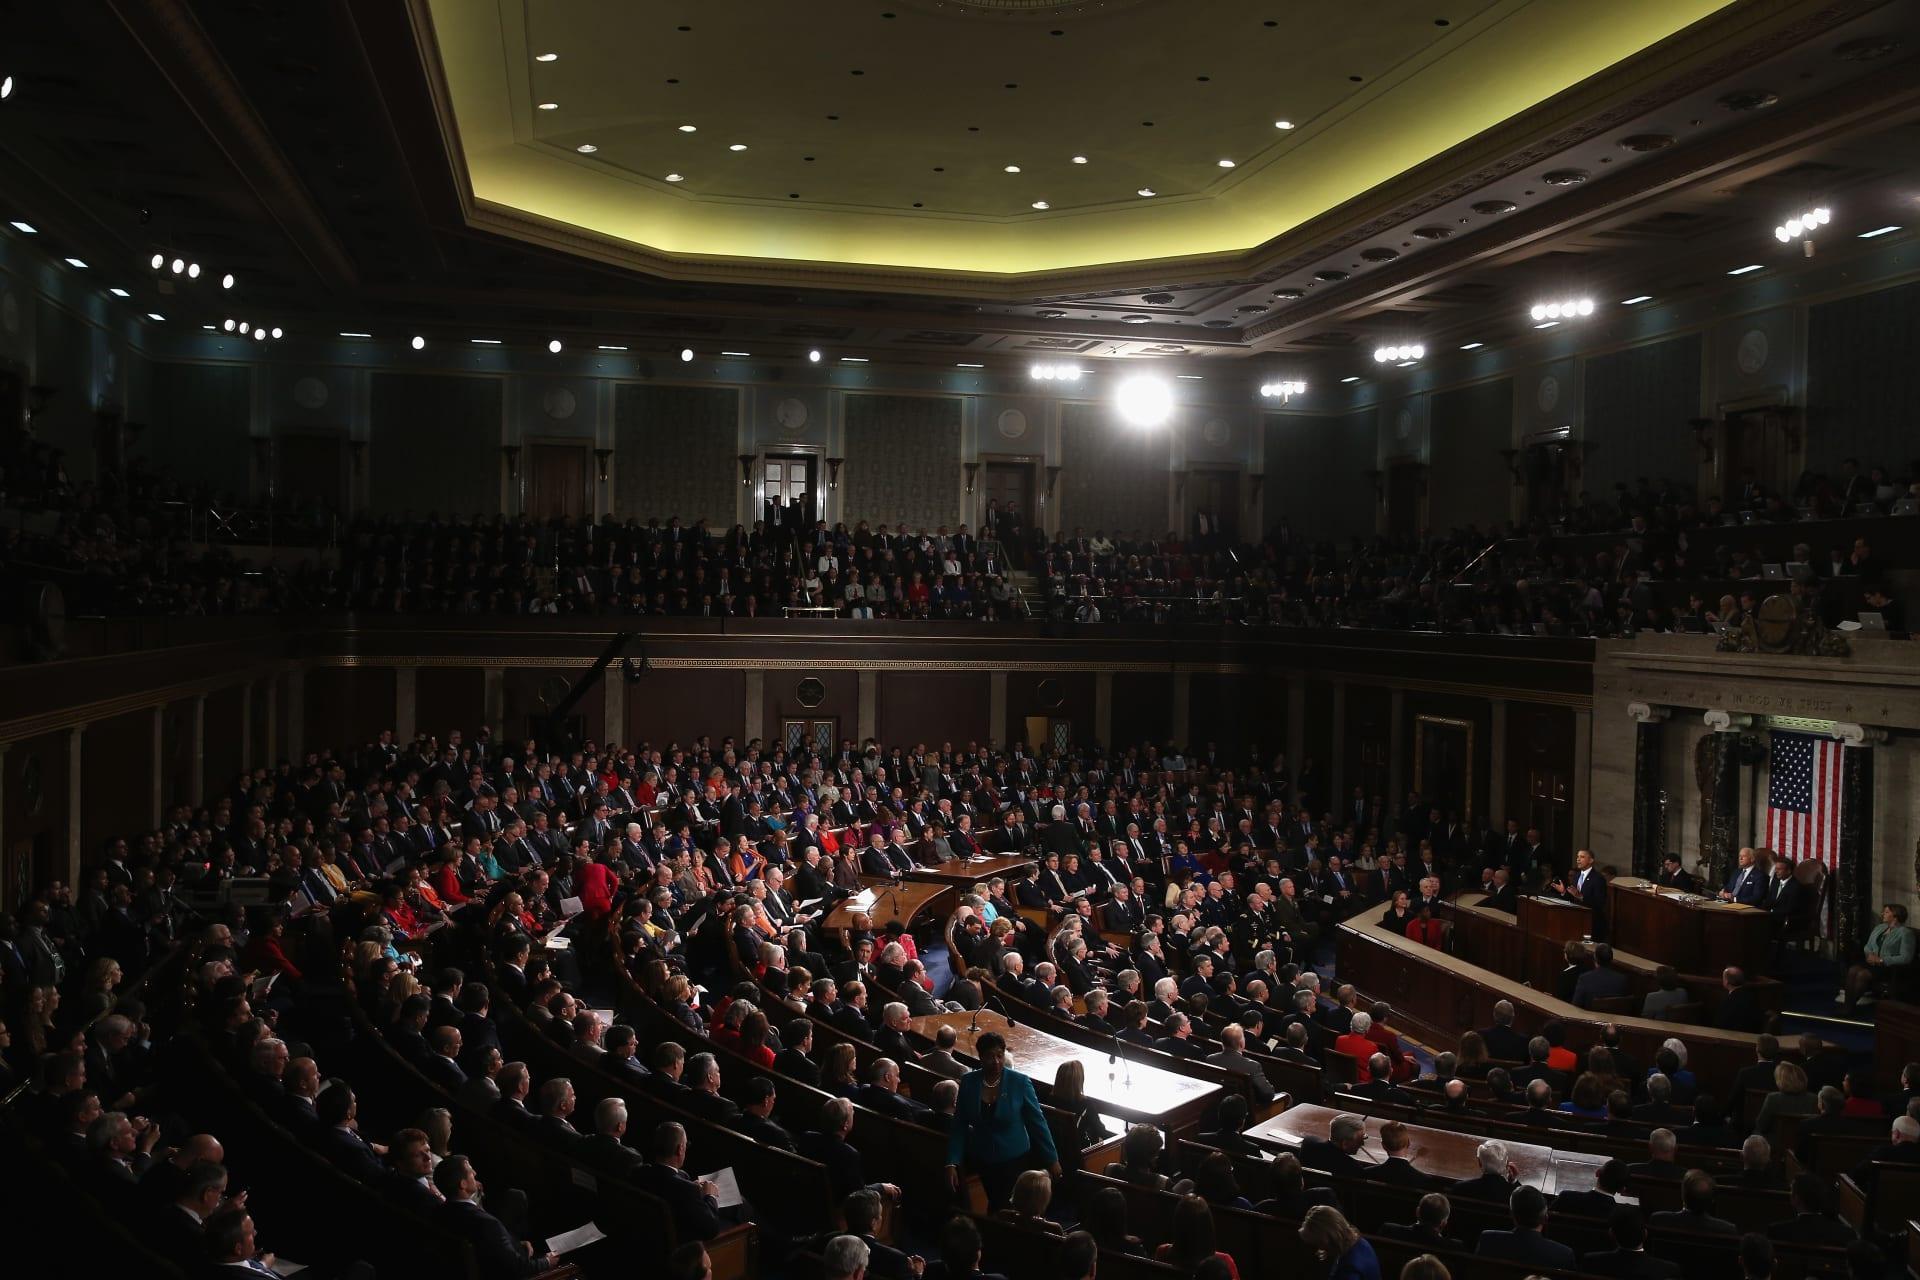 CNN  تكشف هوية السيناتور الذي اعترض تمرير مشروع قانون 11 سبتمبر.. والمفاجأة غير متوقعة